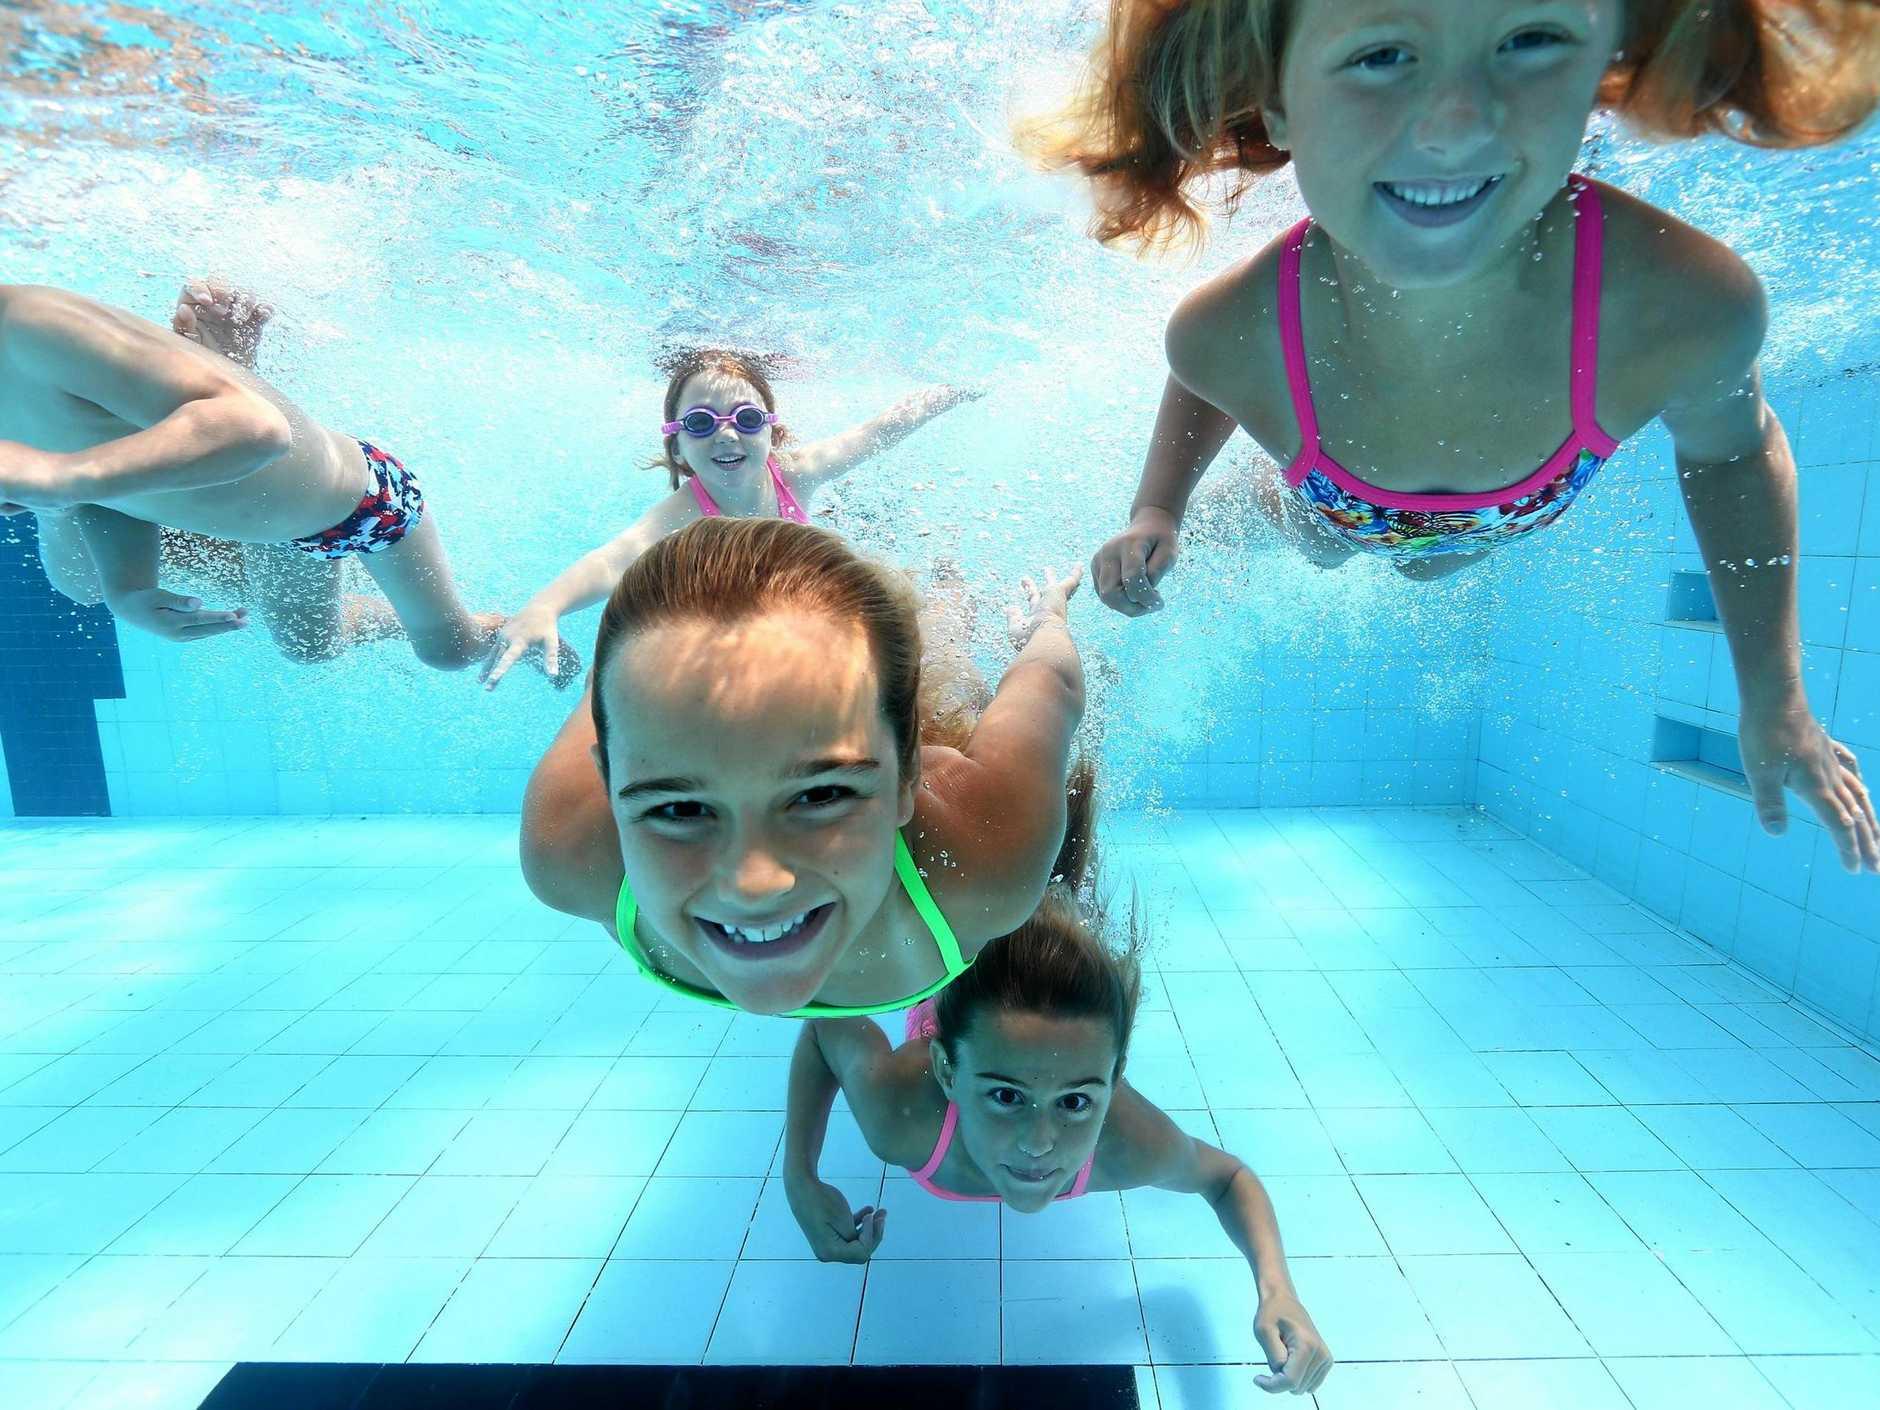 In centre Ryne Spence, 9, having some fun at Miami Aquatic Centre for News Corp Swimming lesson campaign.